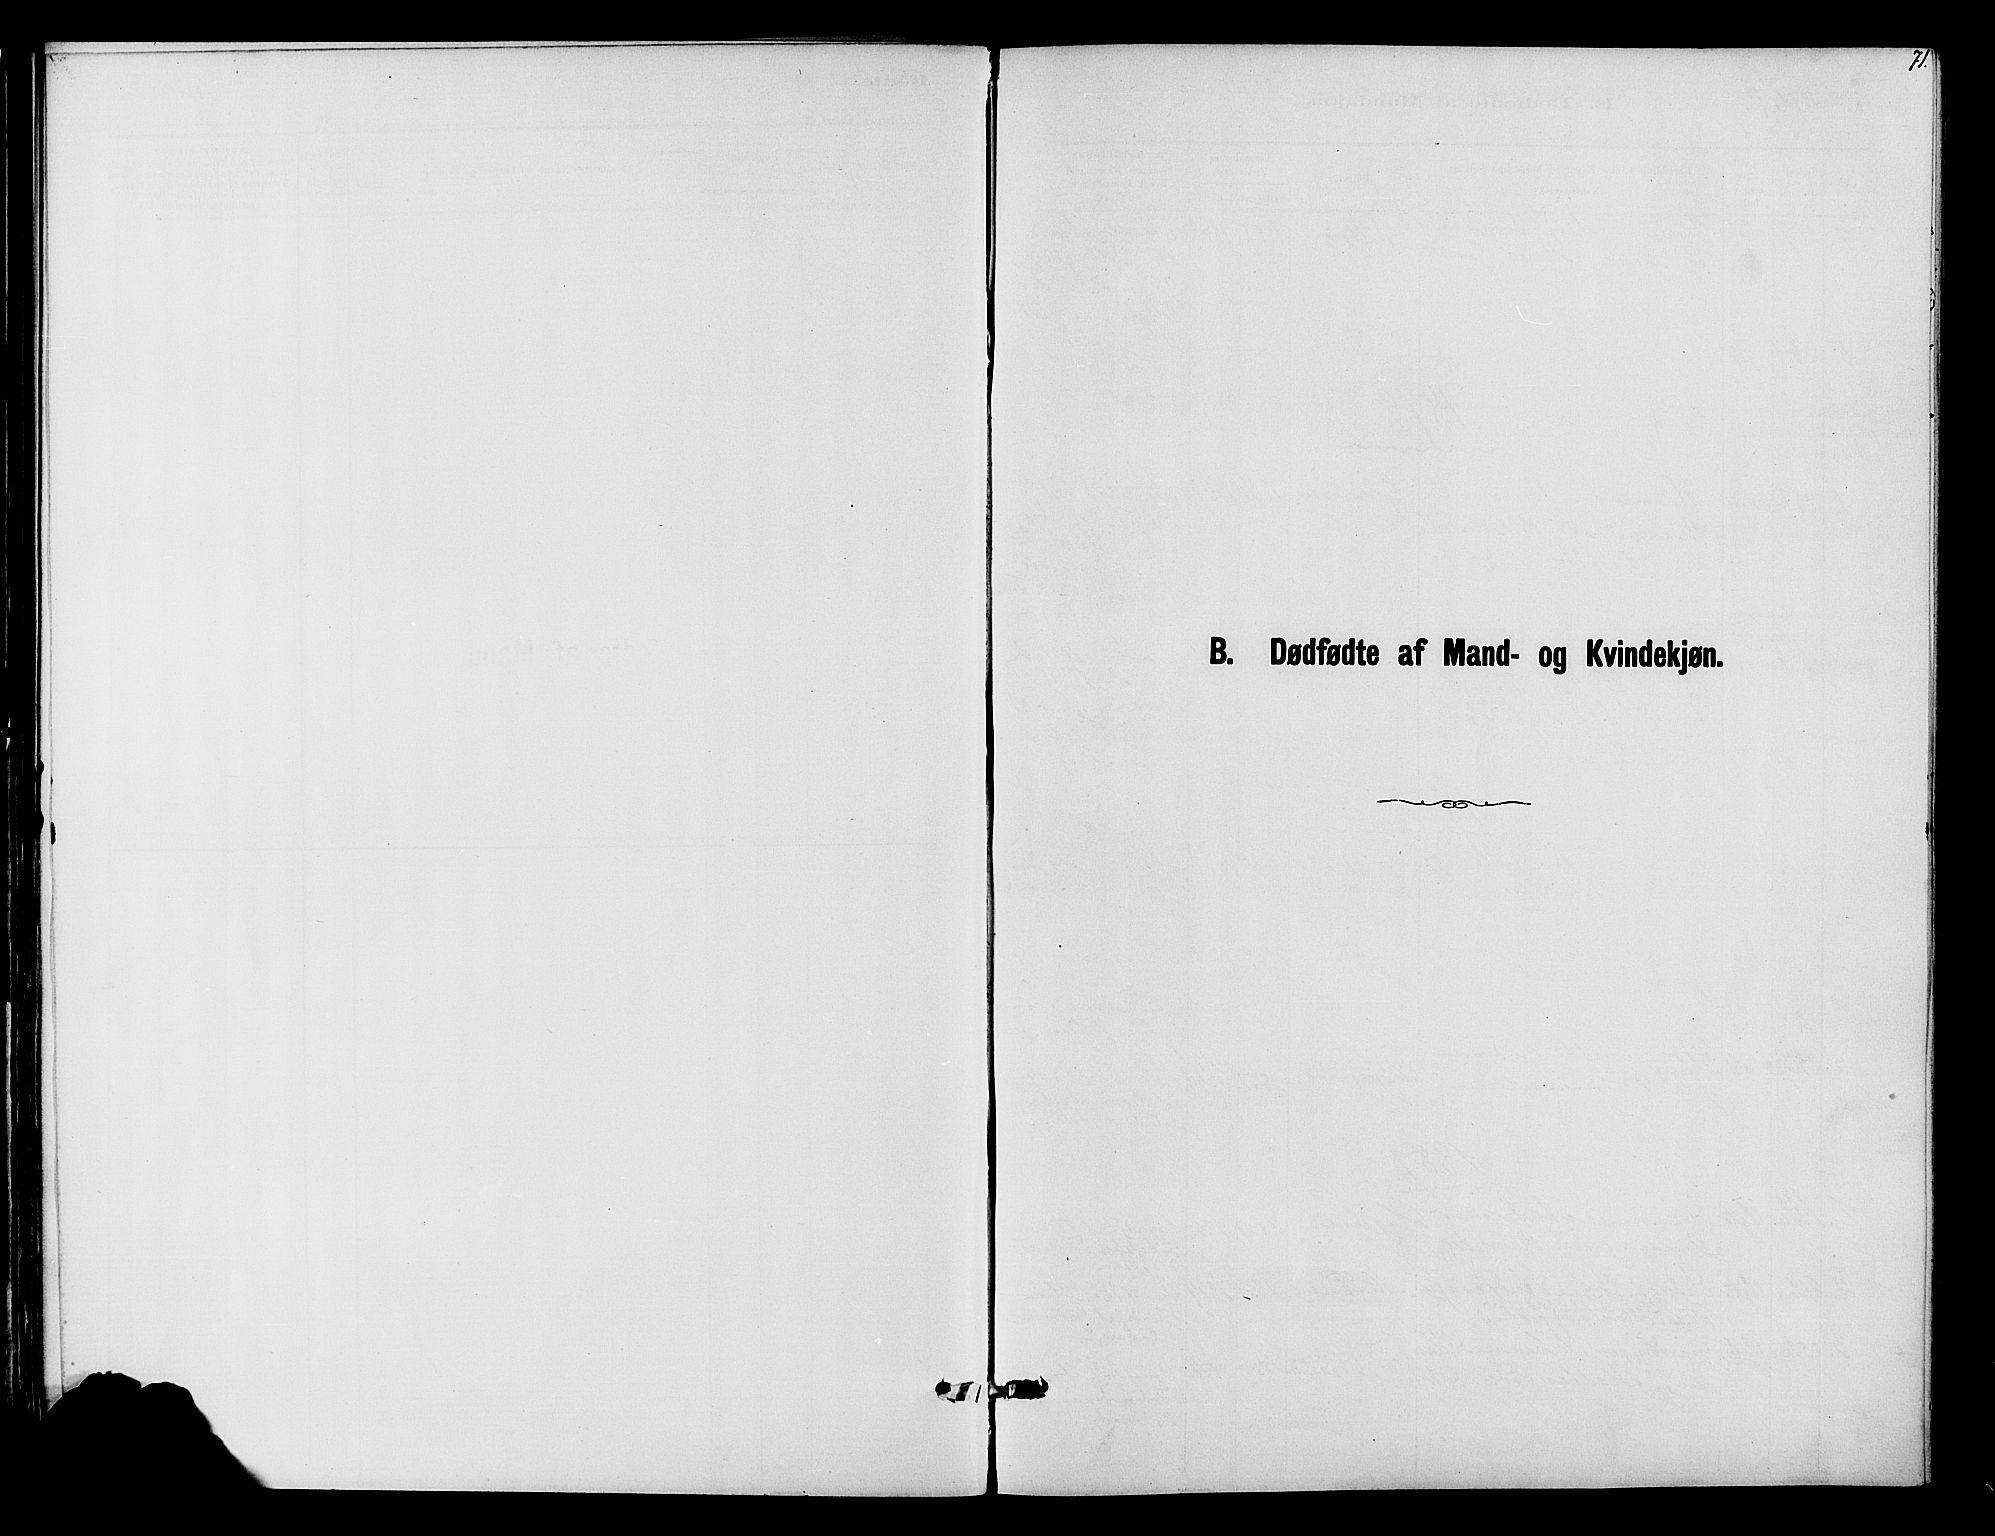 SAH, Vardal prestekontor, H/Ha/Haa/L0010: Ministerialbok nr. 10, 1878-1893, s. 71